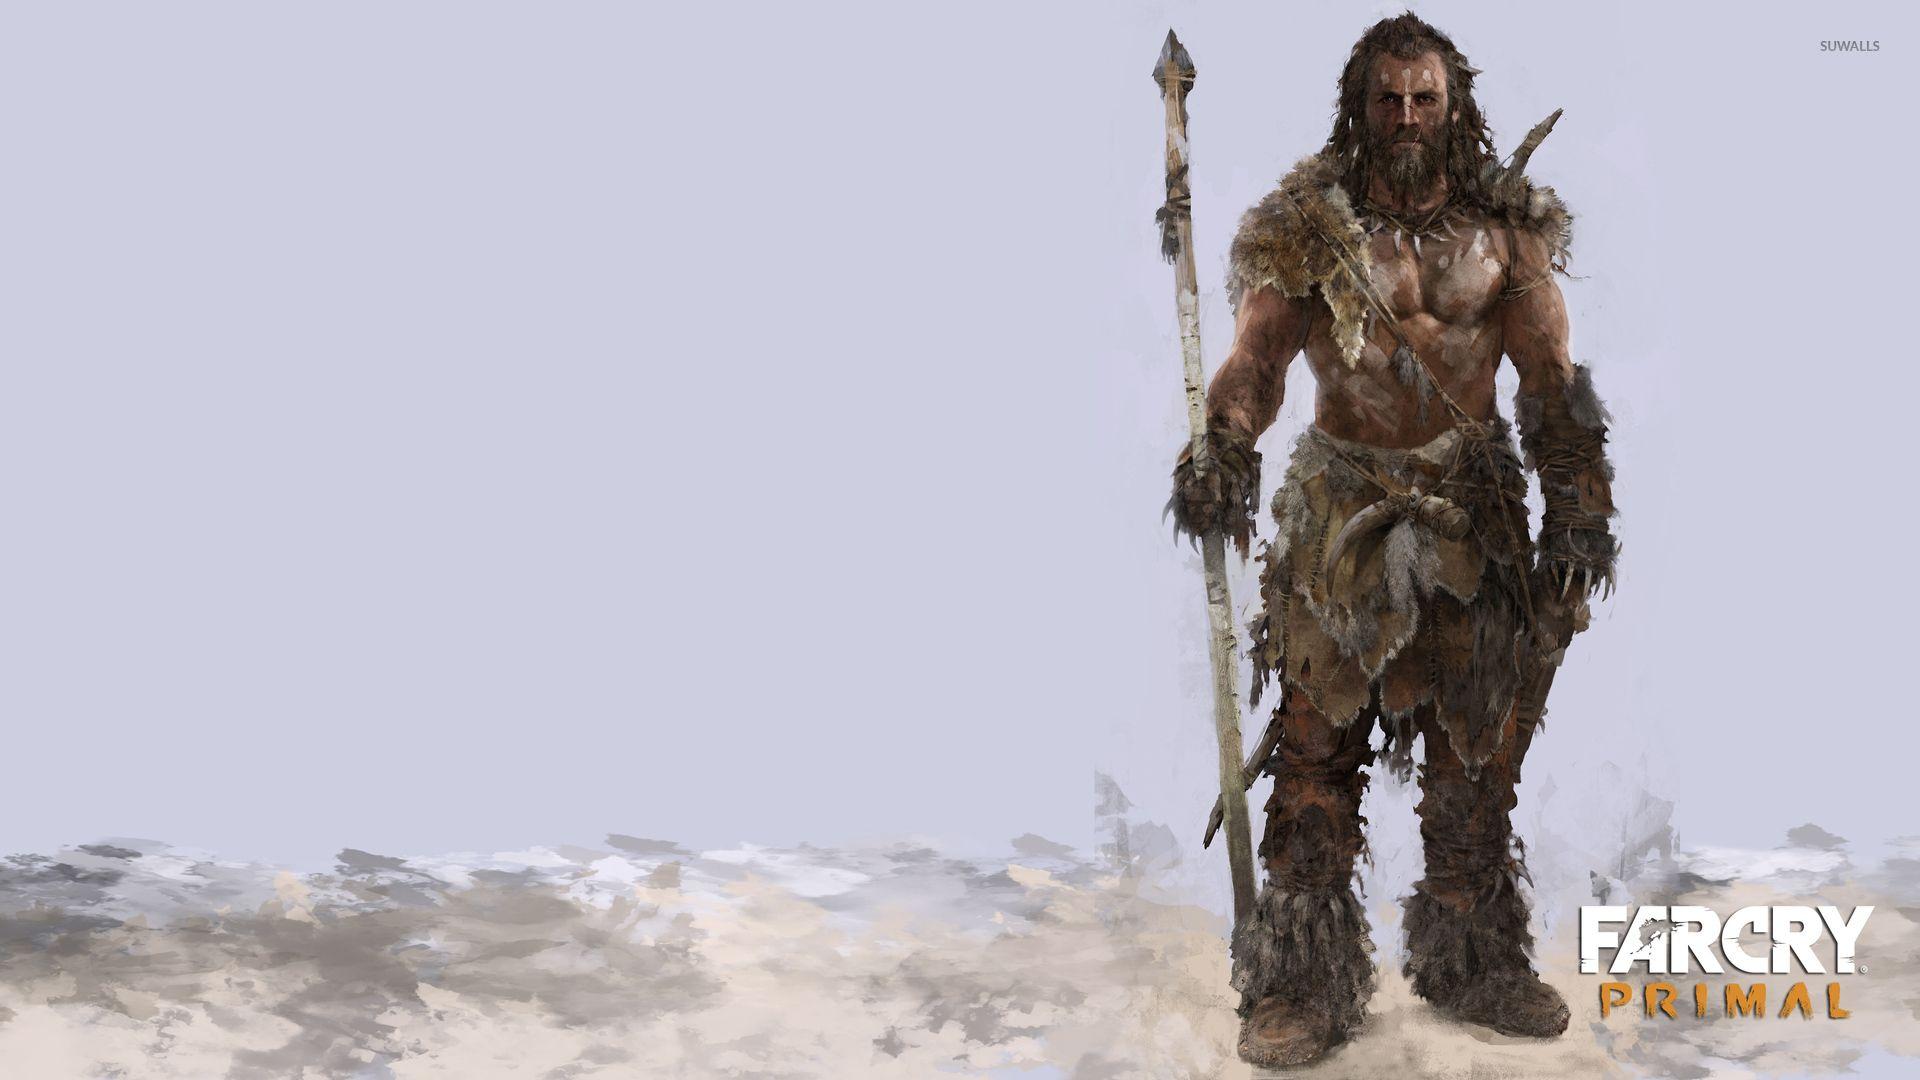 Takkar In Far Cry Primal Wallpaper Game Wallpapers 53569